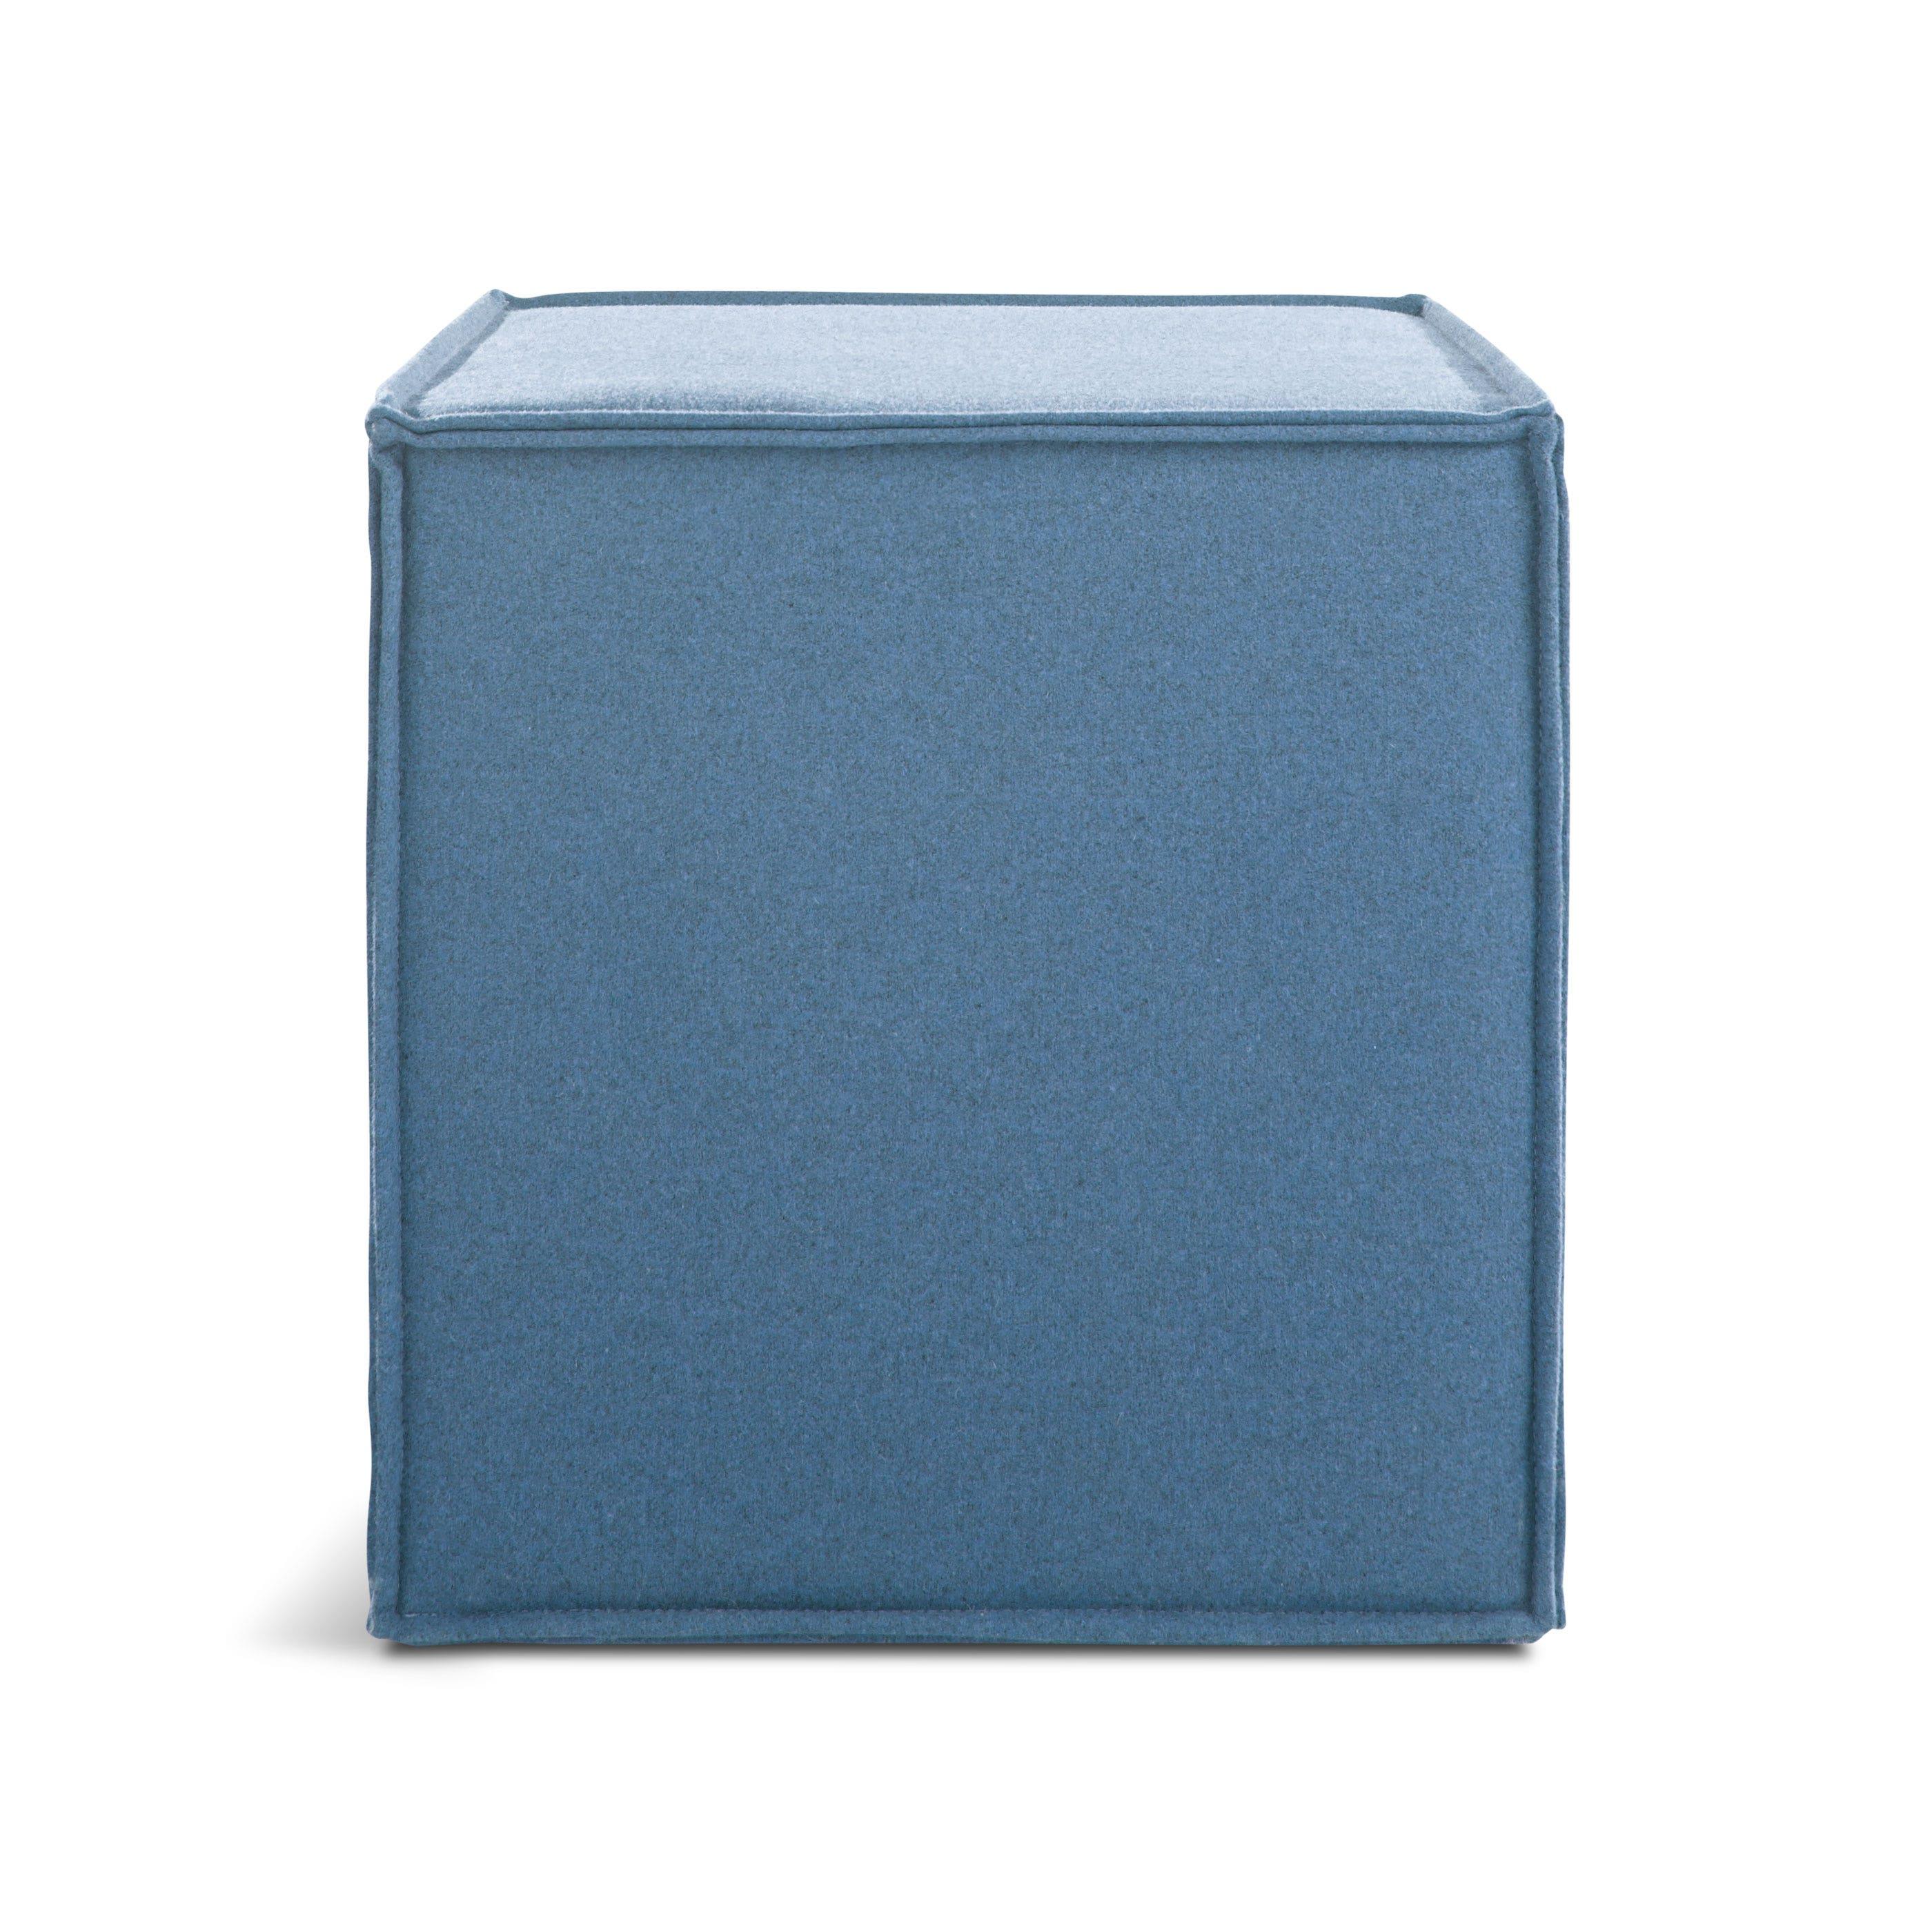 Otto Cube Ottoman - Modern Cube Ottoman | Blu Dot